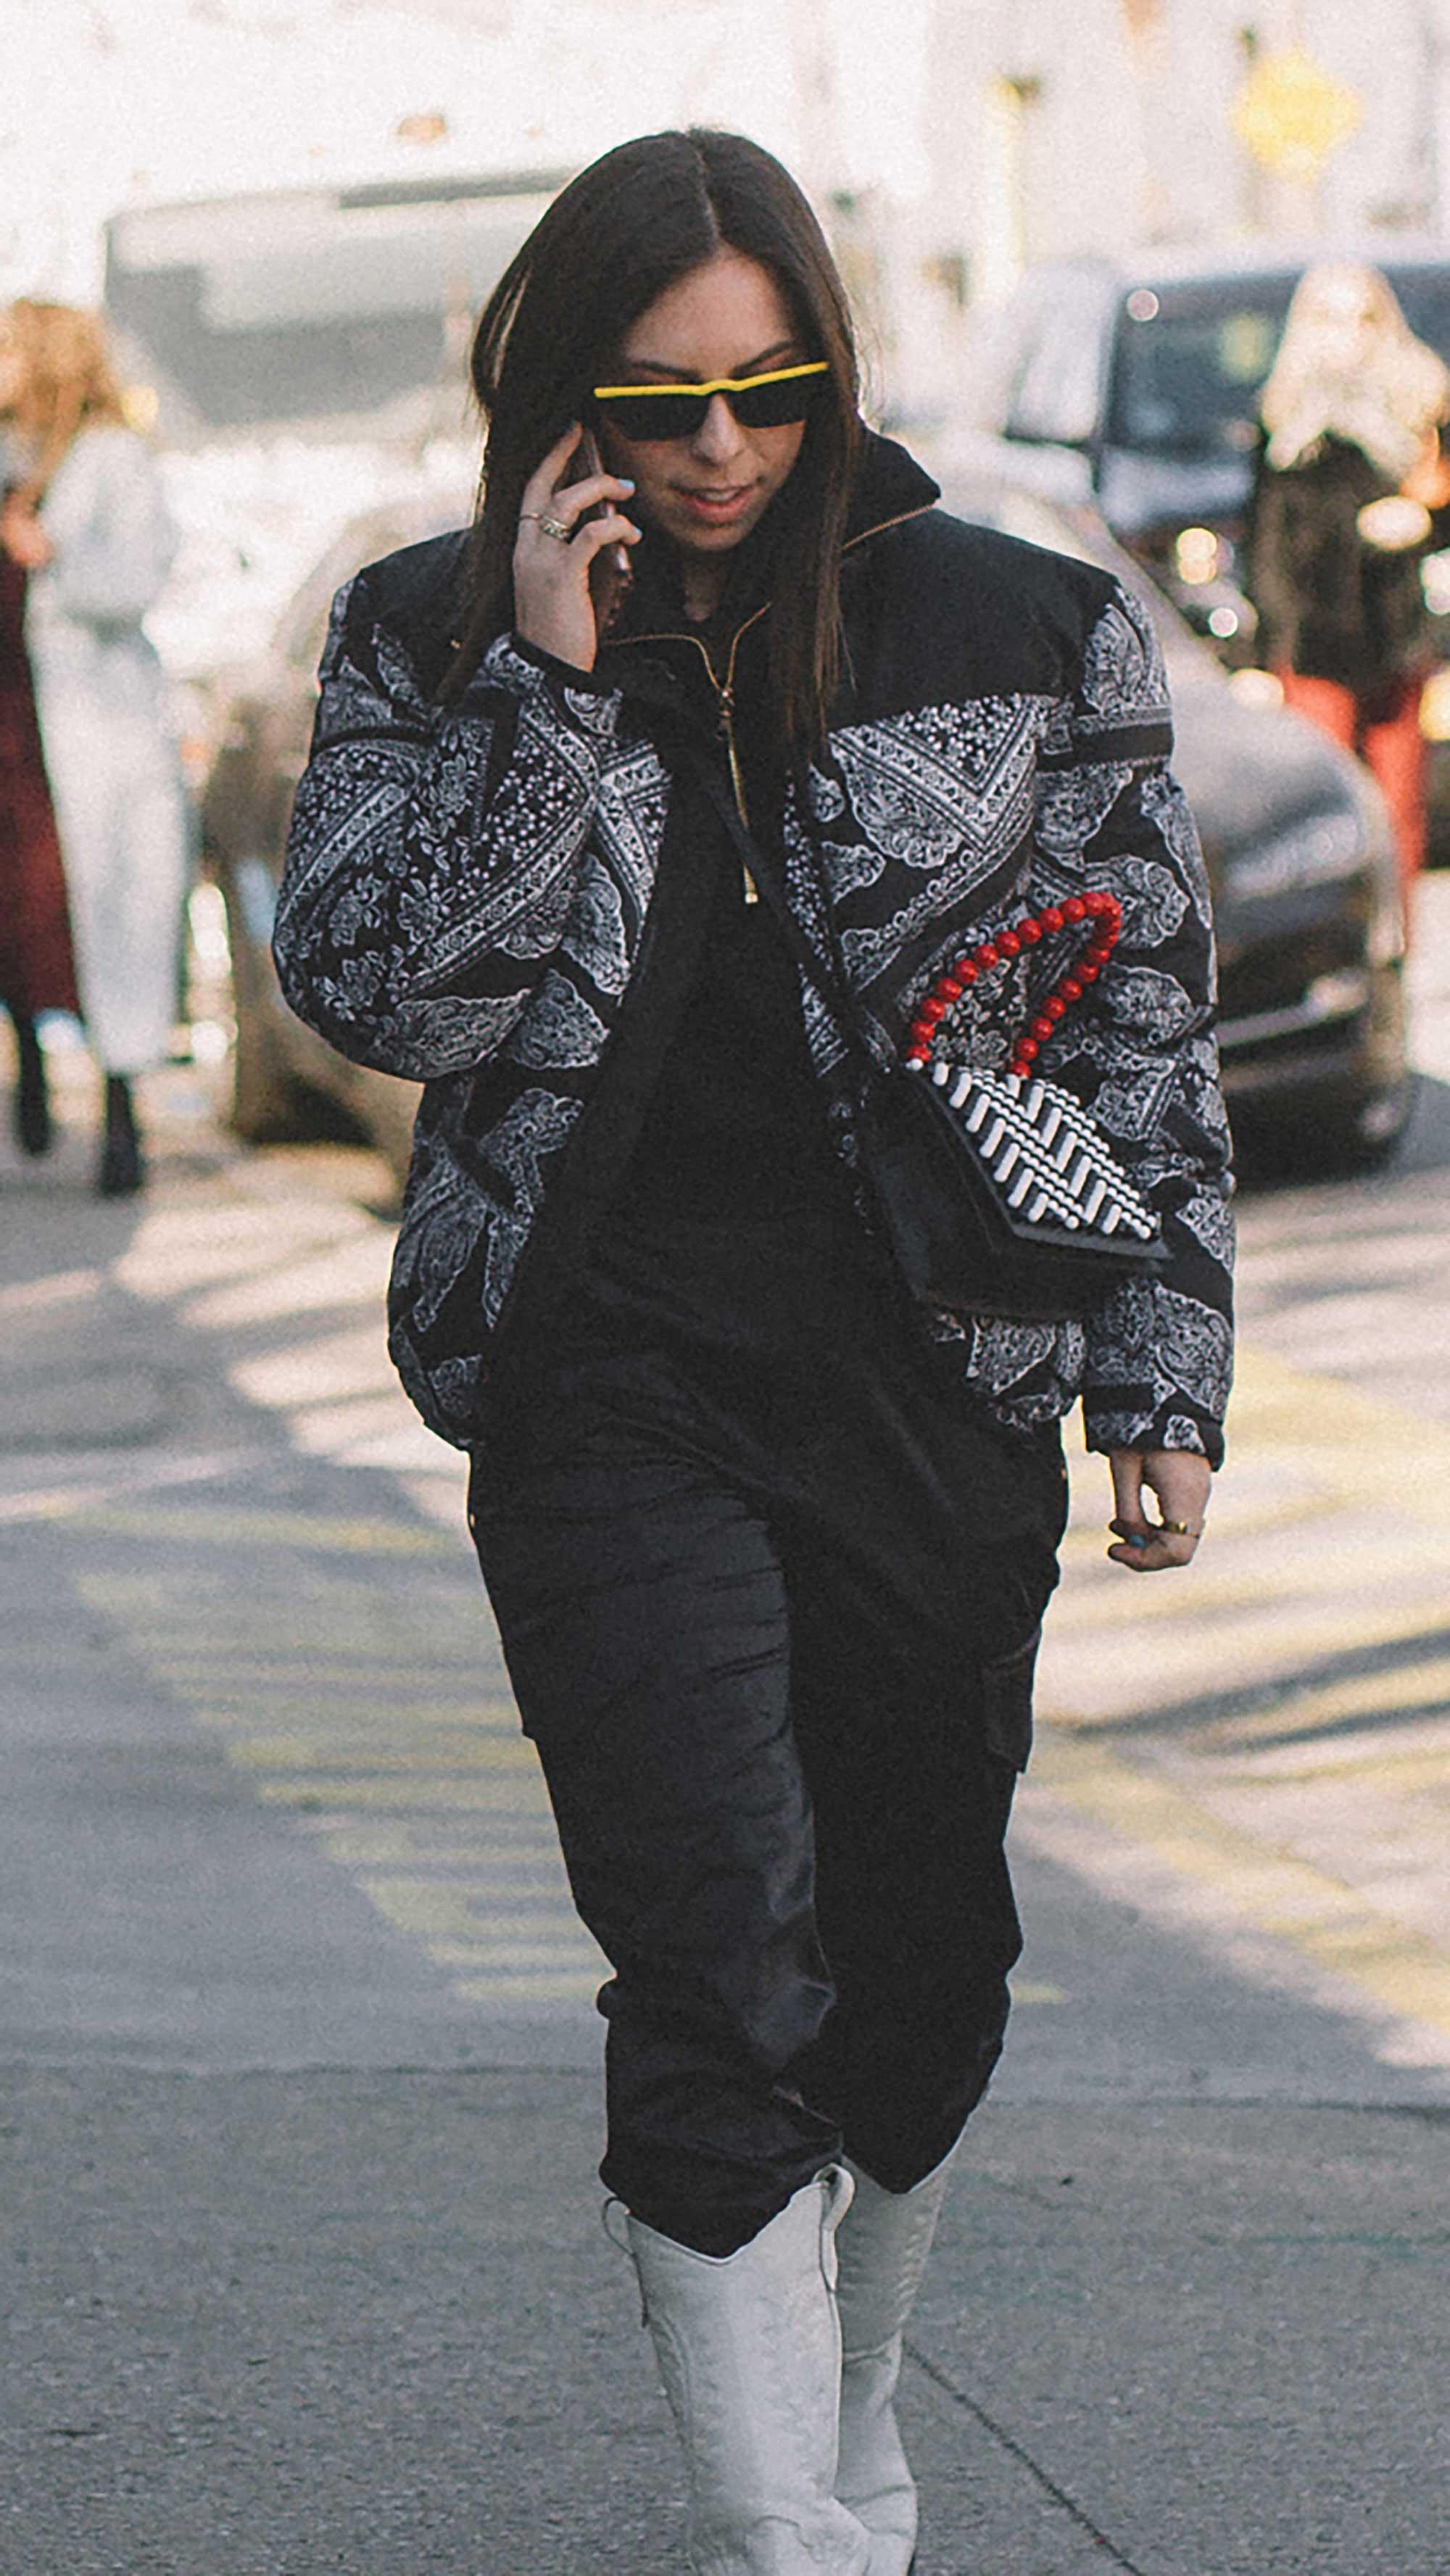 Best outfits of New York Fashion Week street style day three NYFW FW19 - 62.jpg